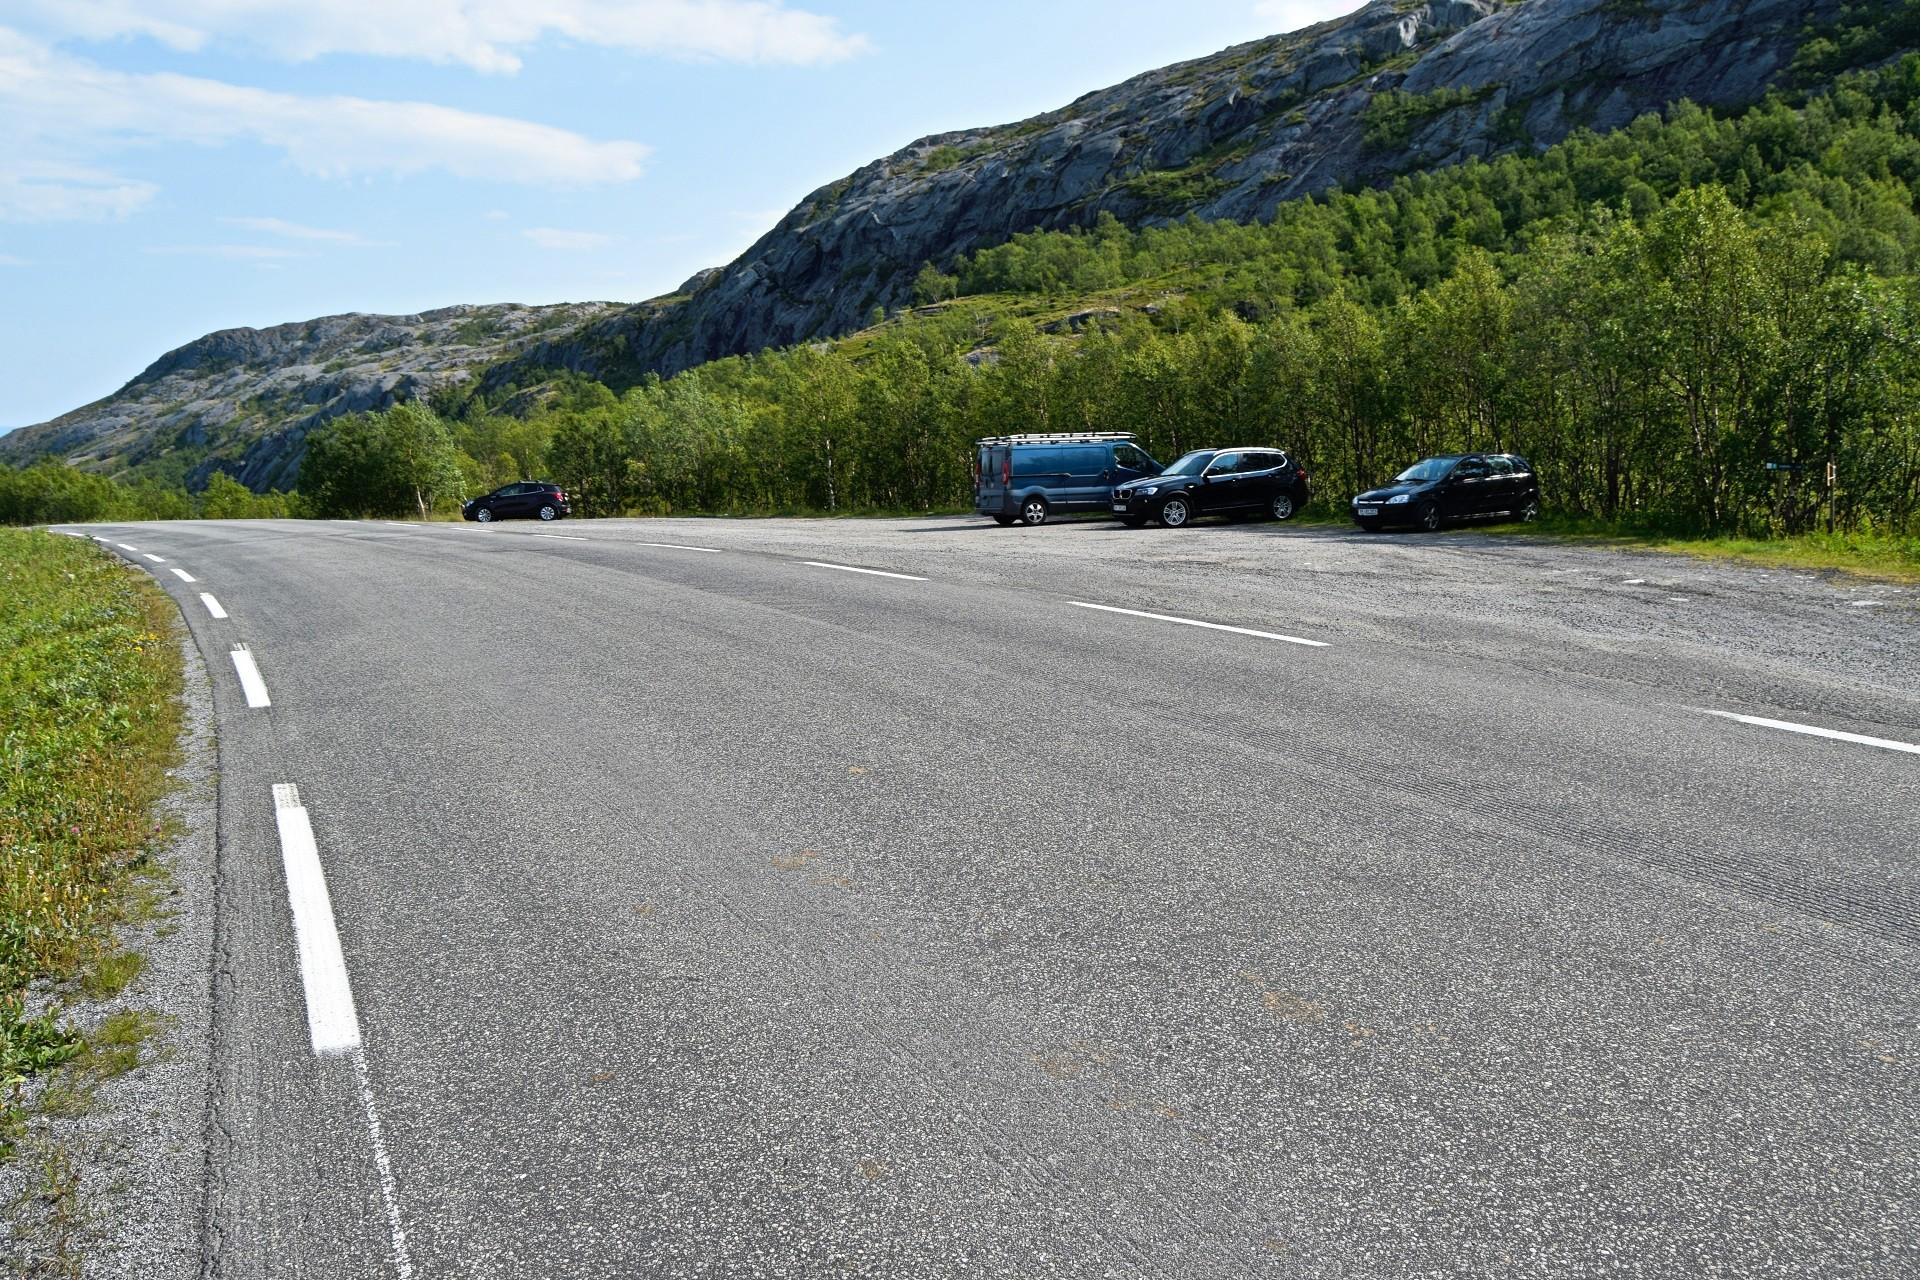 Parkeringsplassen på Kvikstadheia